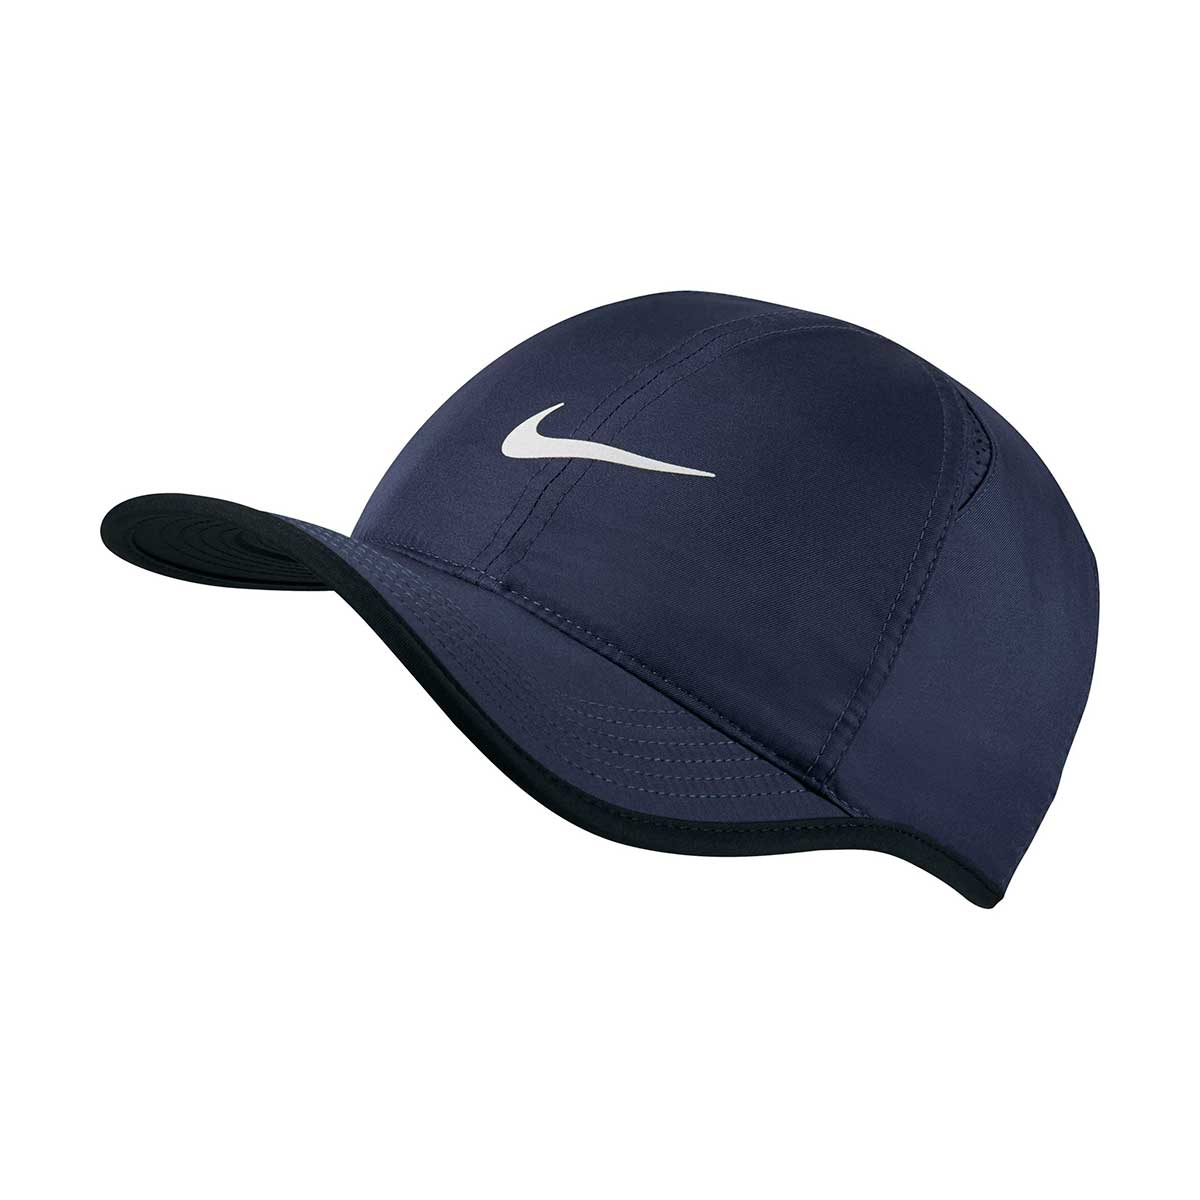 6c4fef7c3 Nike Dri-fit Feather Light Adjustable Cap (Navy)